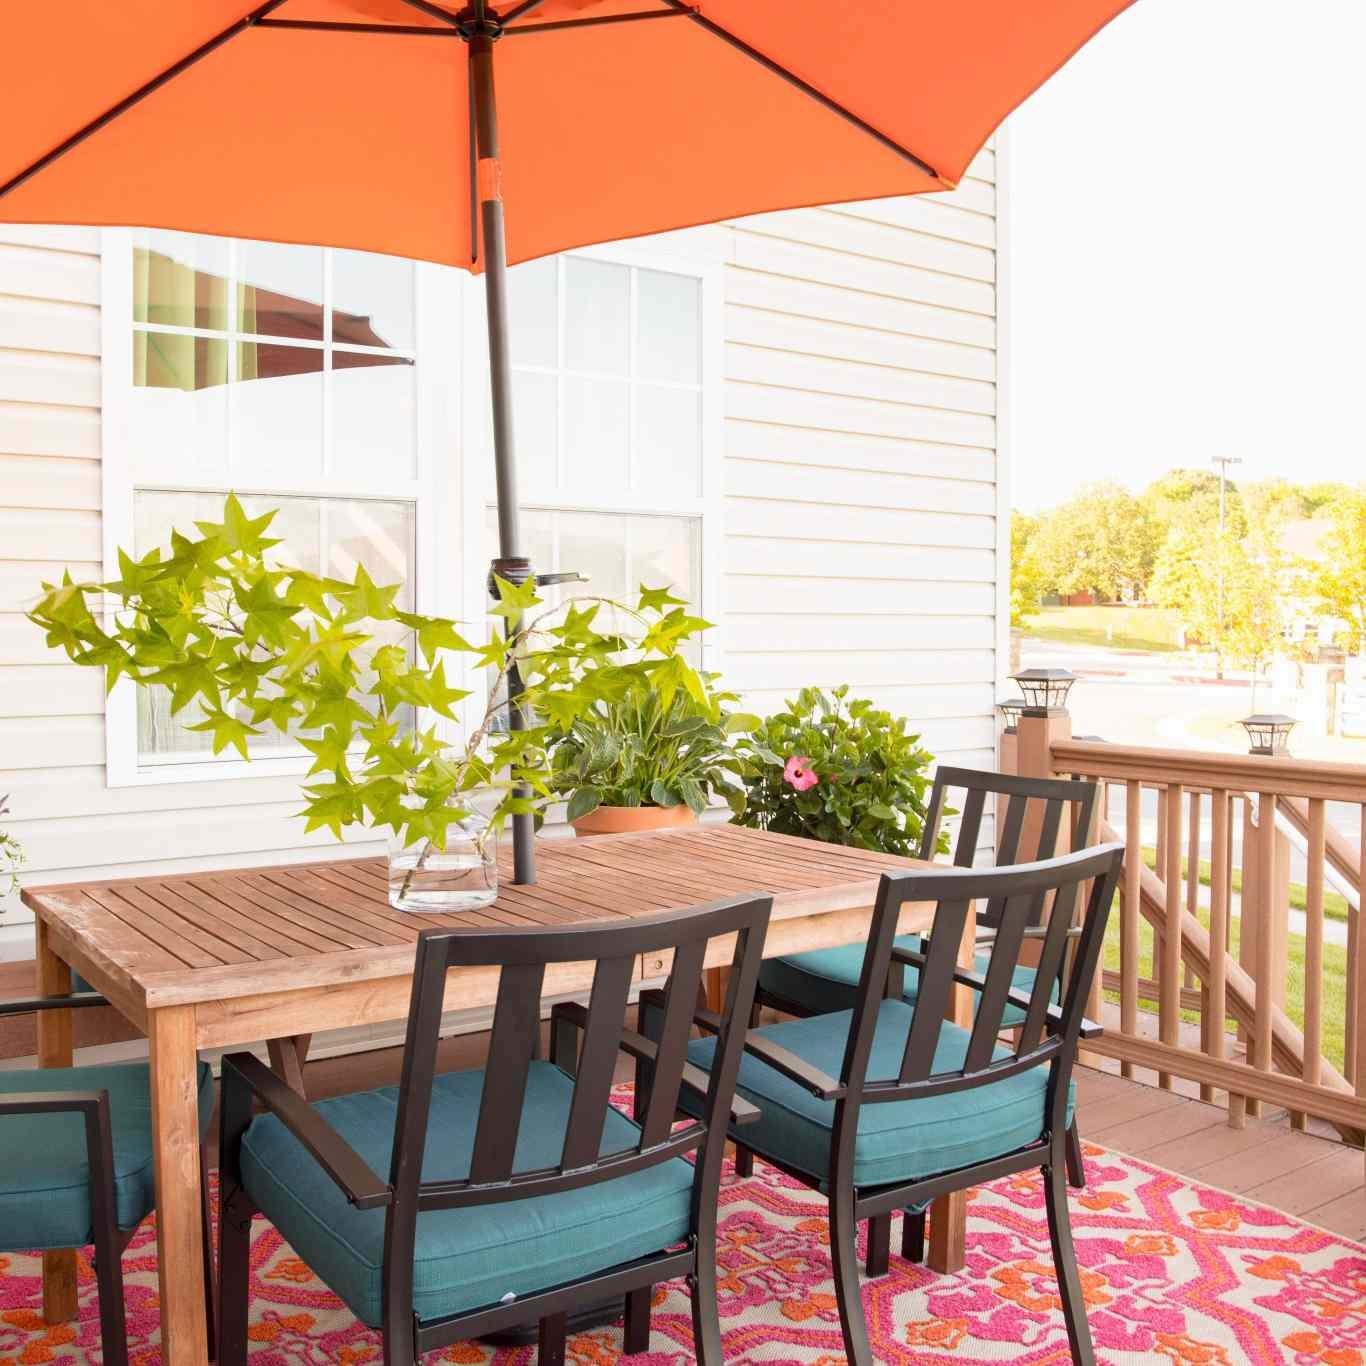 Small patio table and umbrella